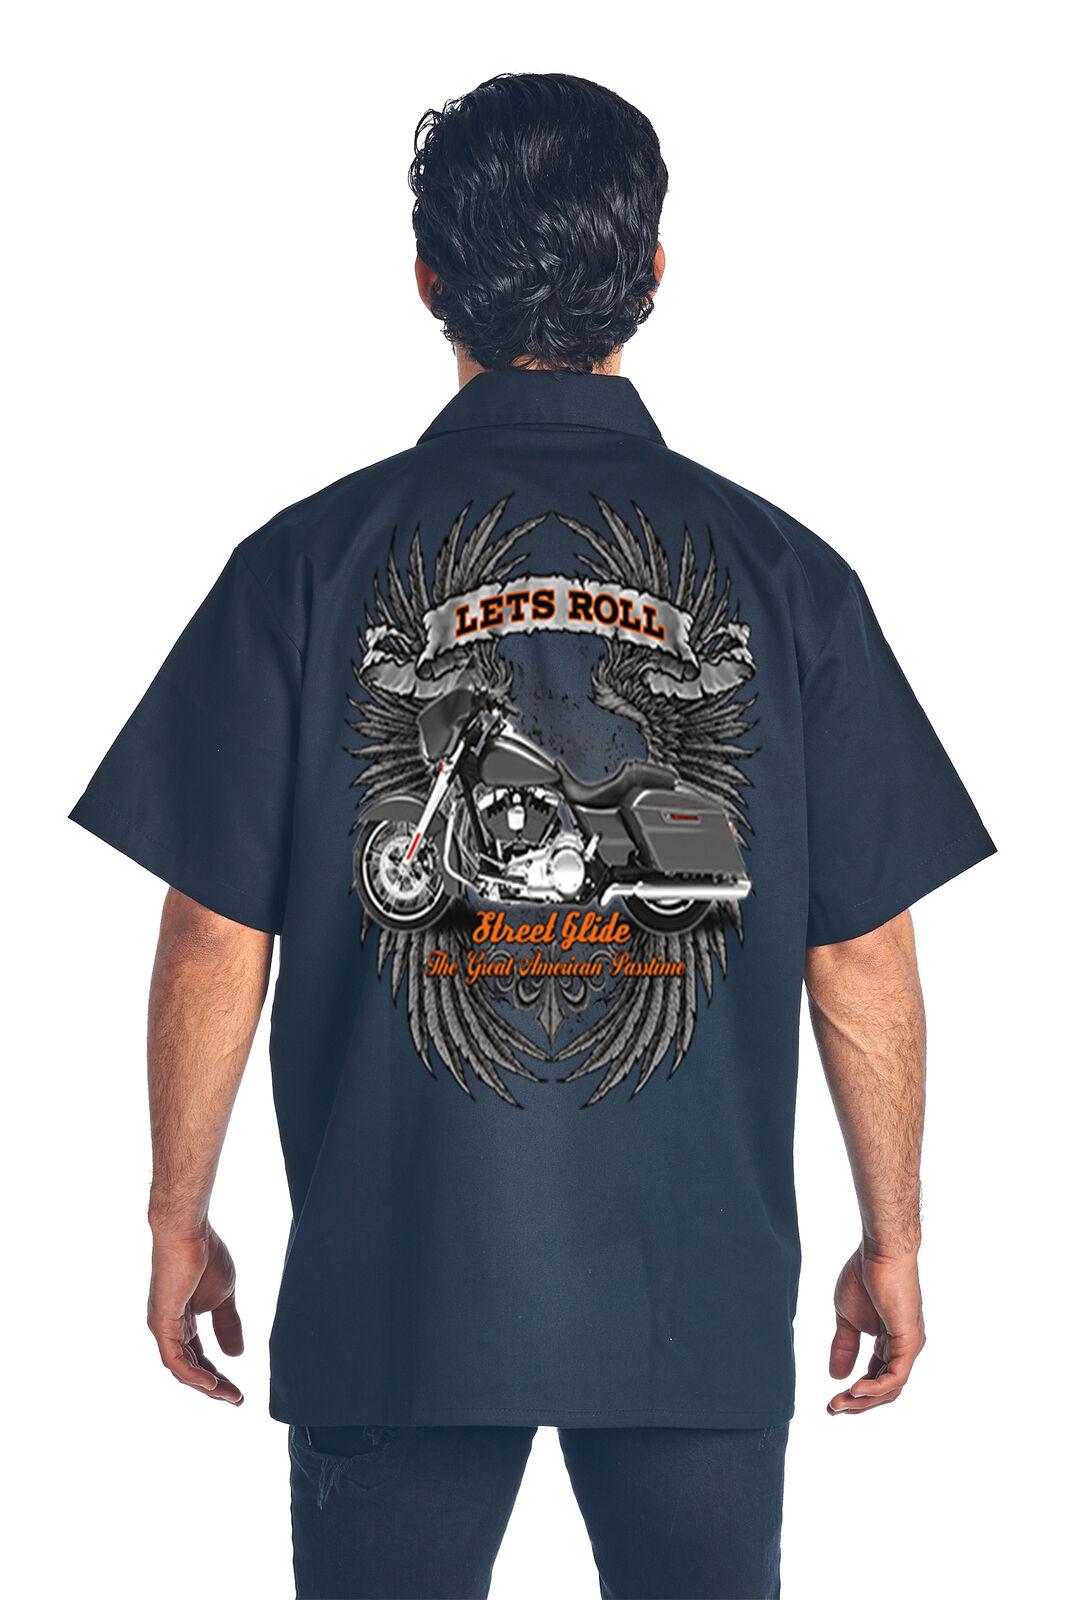 Men/'s Let/'s Roll Great American Pastime Mechanic Work Shirt